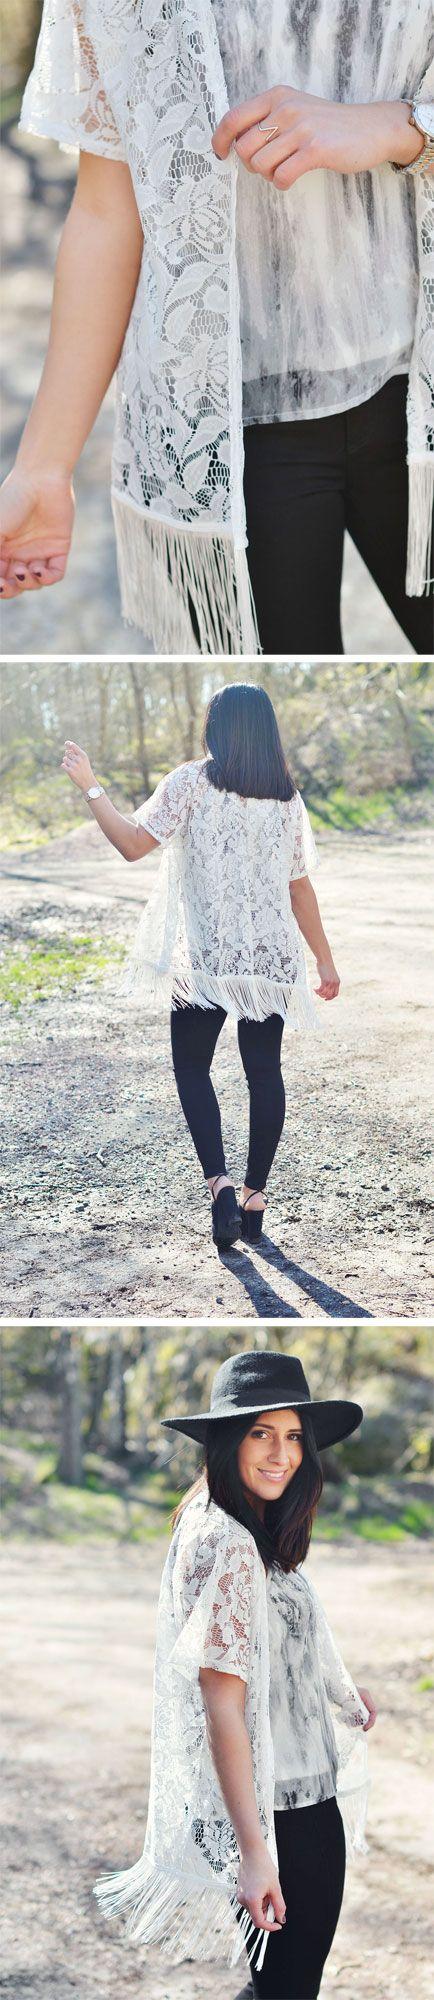 Cardigan i vit spets, linne med marmor-print, svarta byxor | White lace cardigan marble top black crop pants outfit inspiration summer spring festival | www.mandeldesign.se